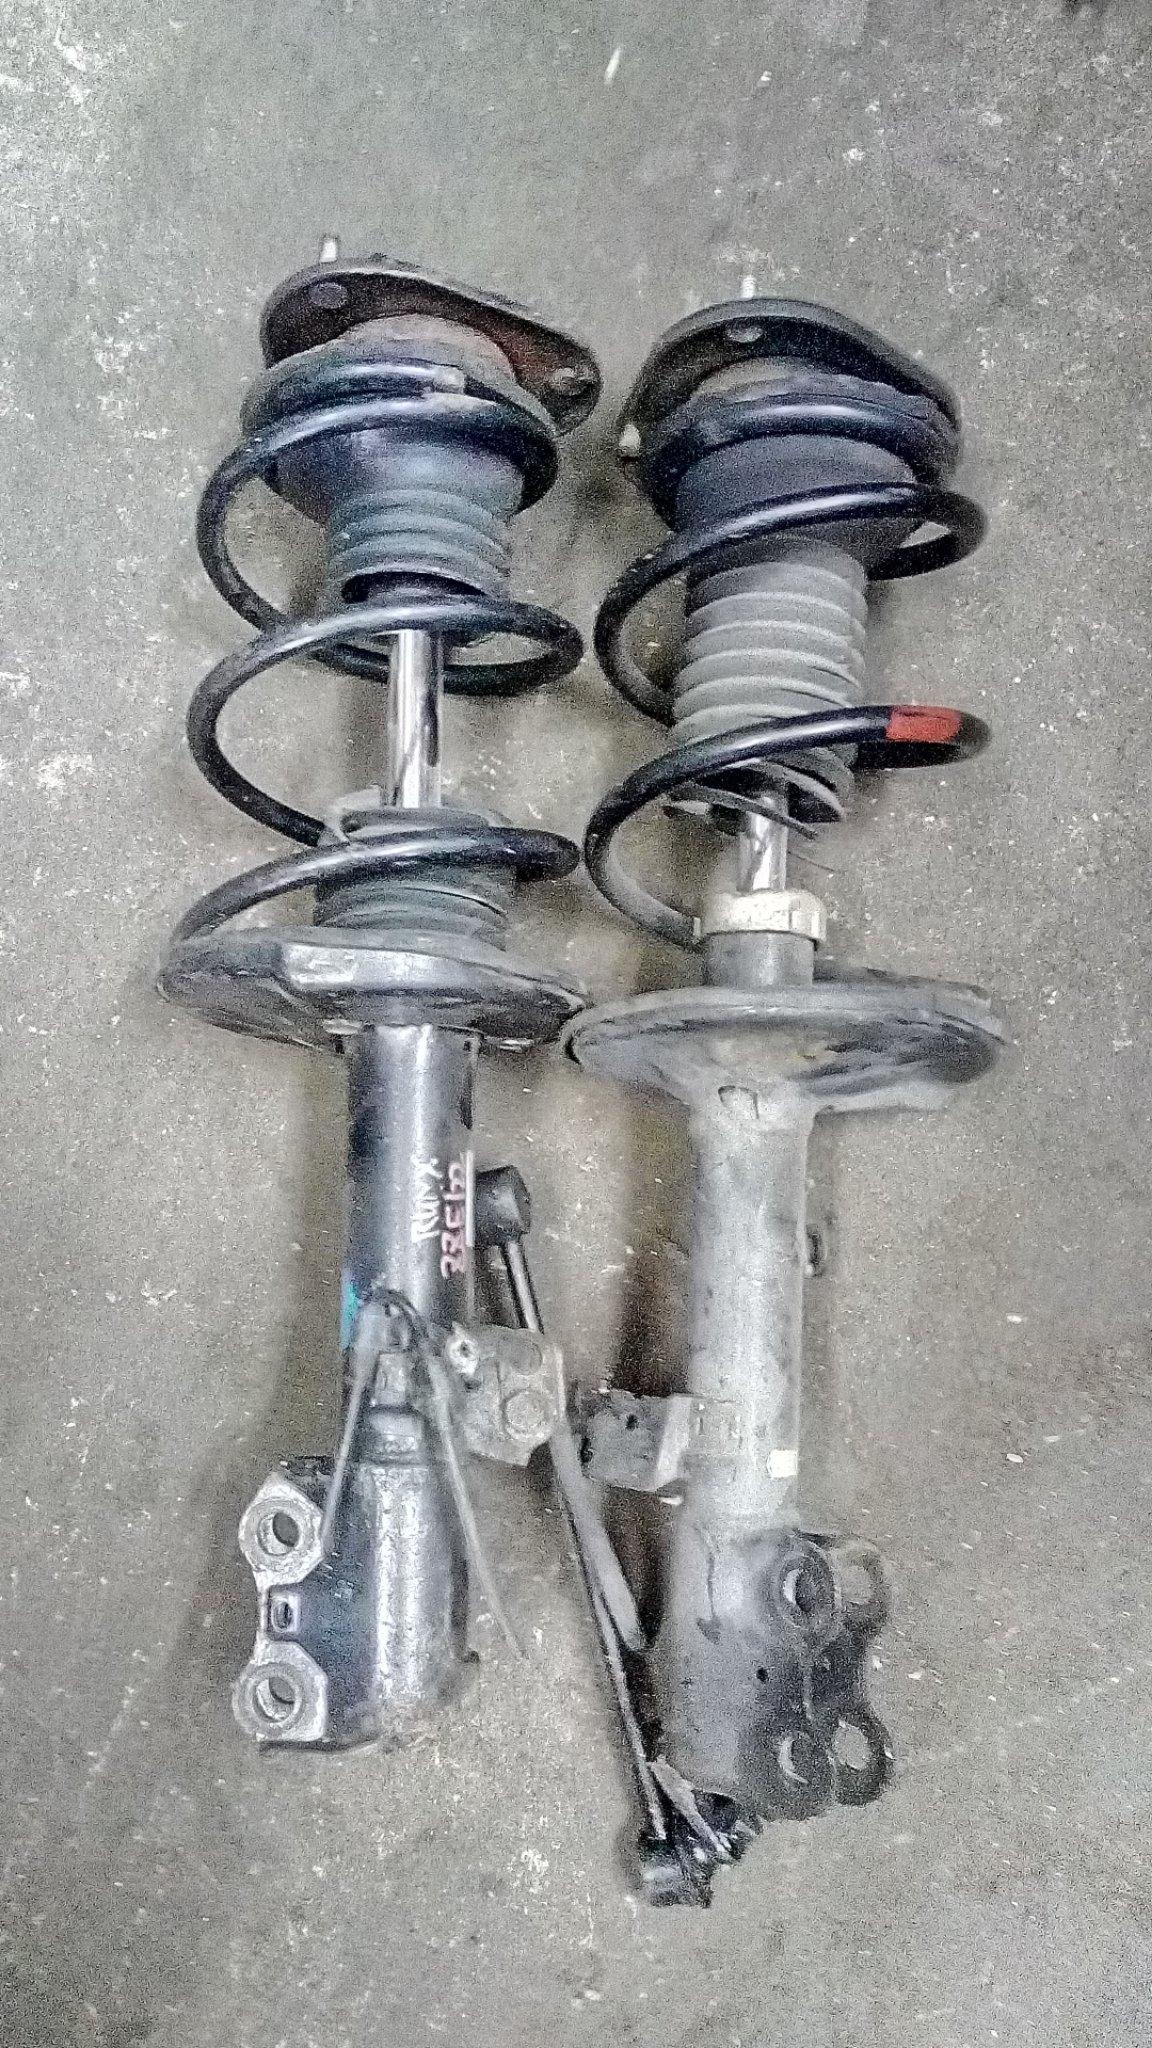 Toyota runx front shocks 01352